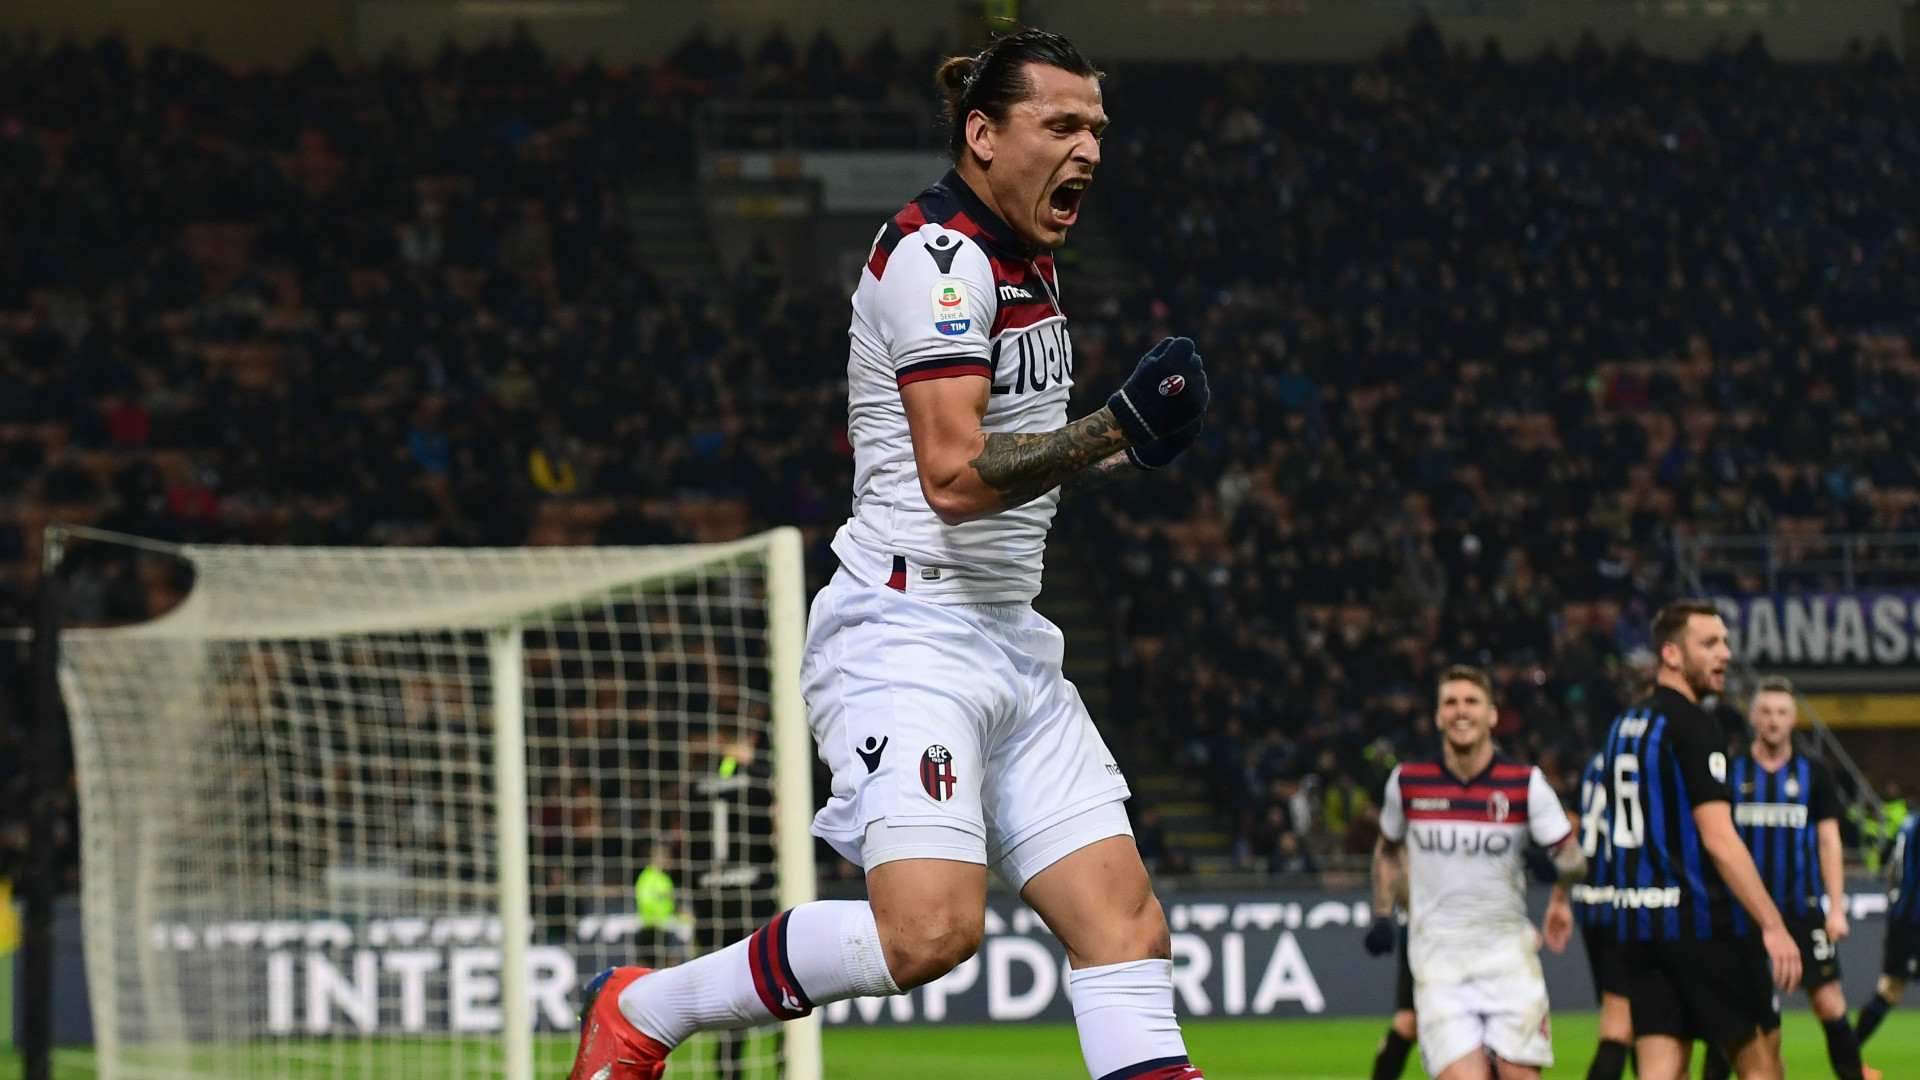 Santander Inter Bologna